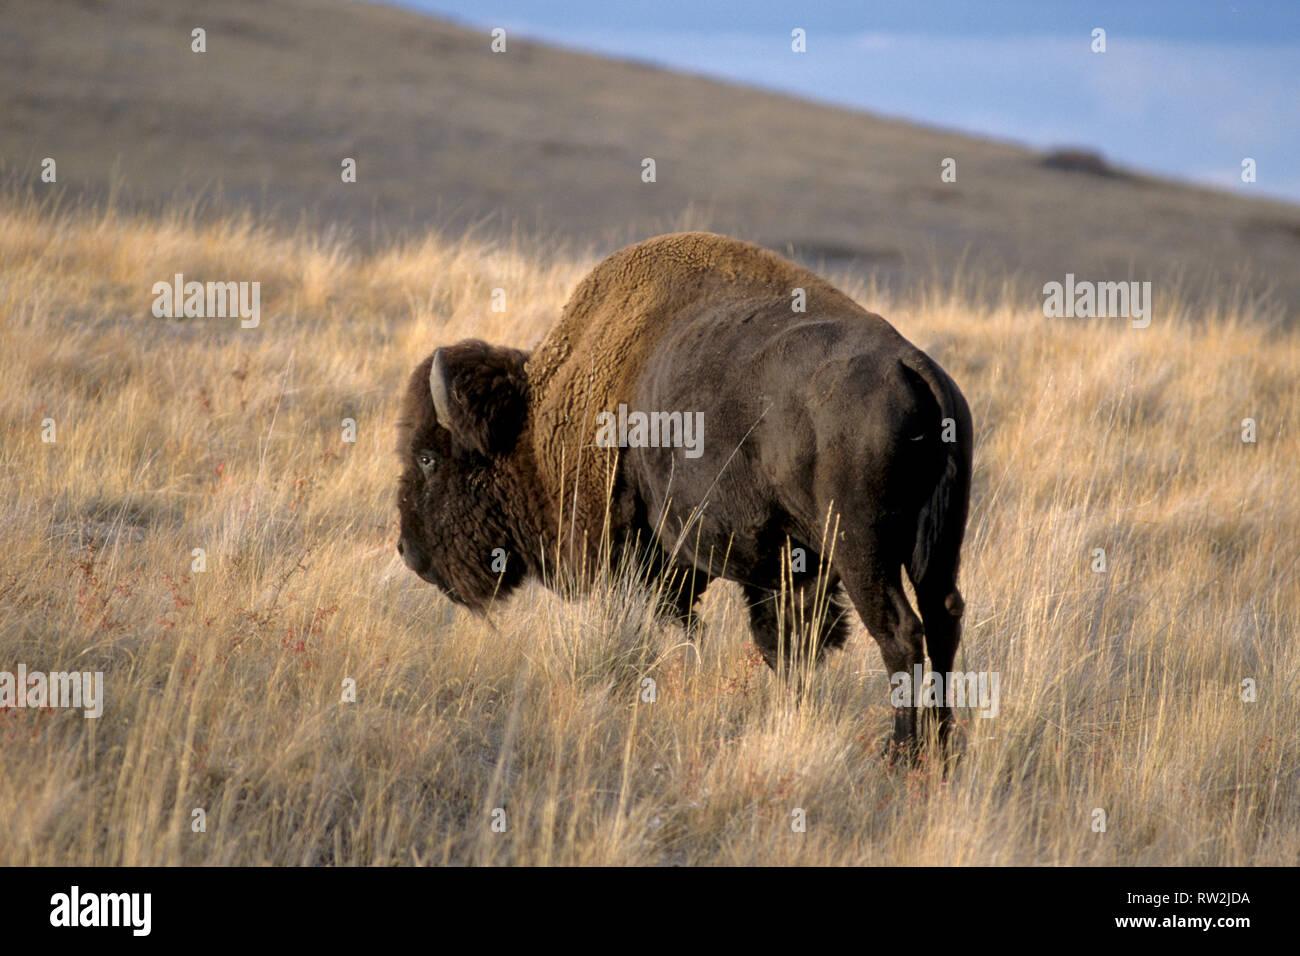 Bison; National Bison Range, NW Montana Stockbild